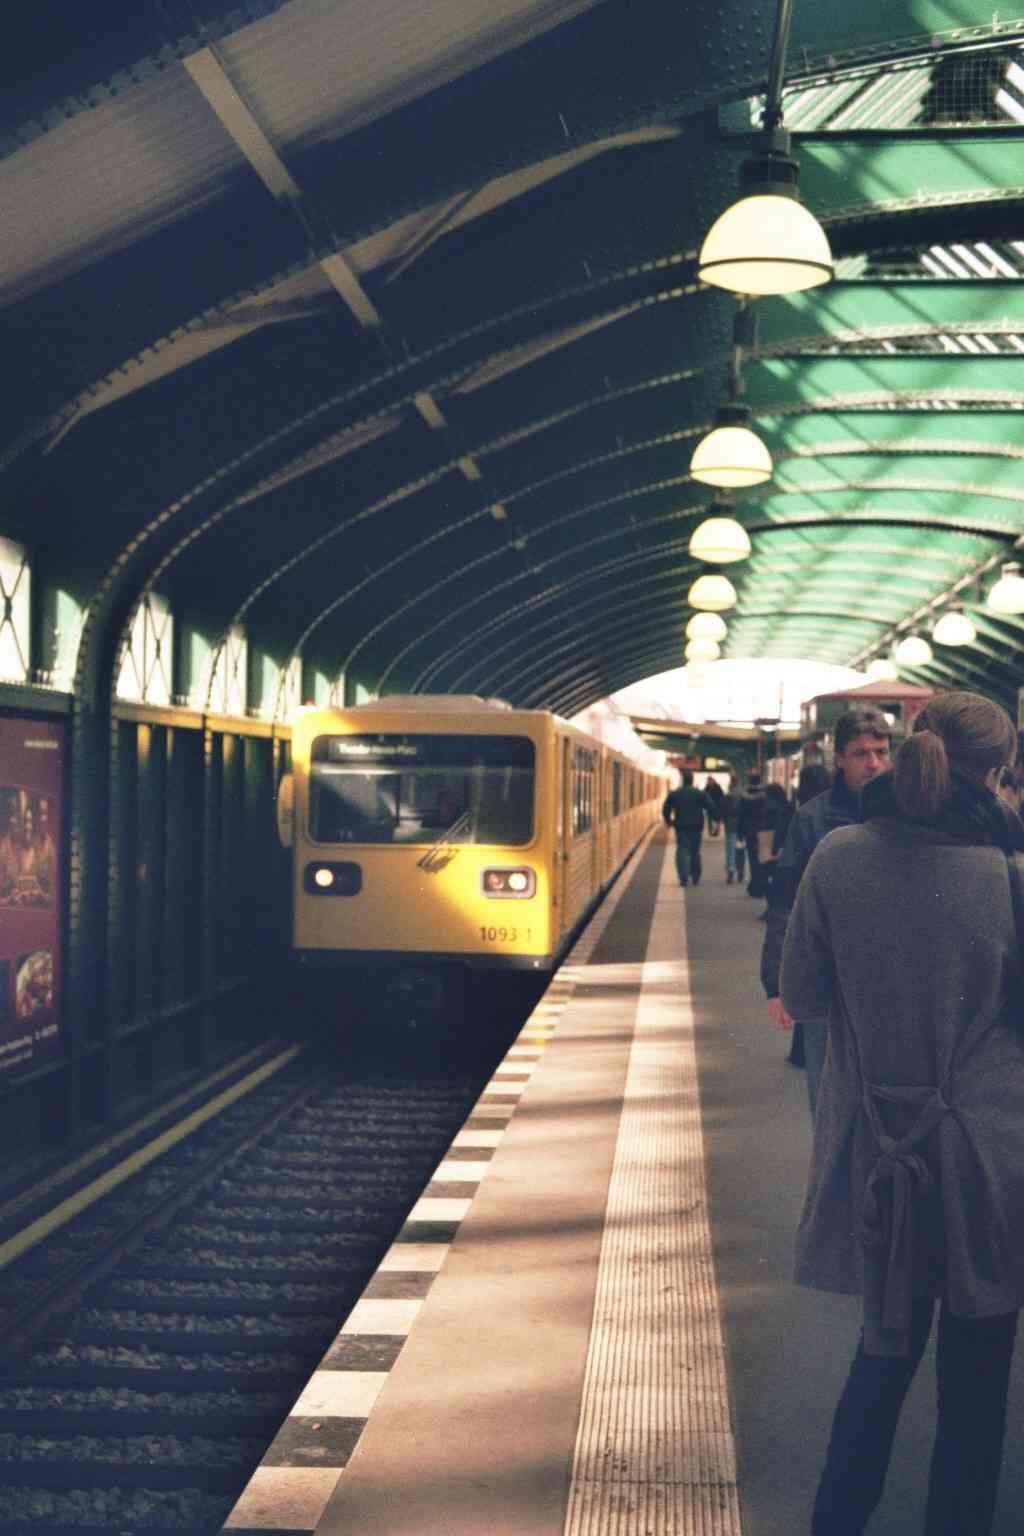 Eberwalderstr U-Bahnhof